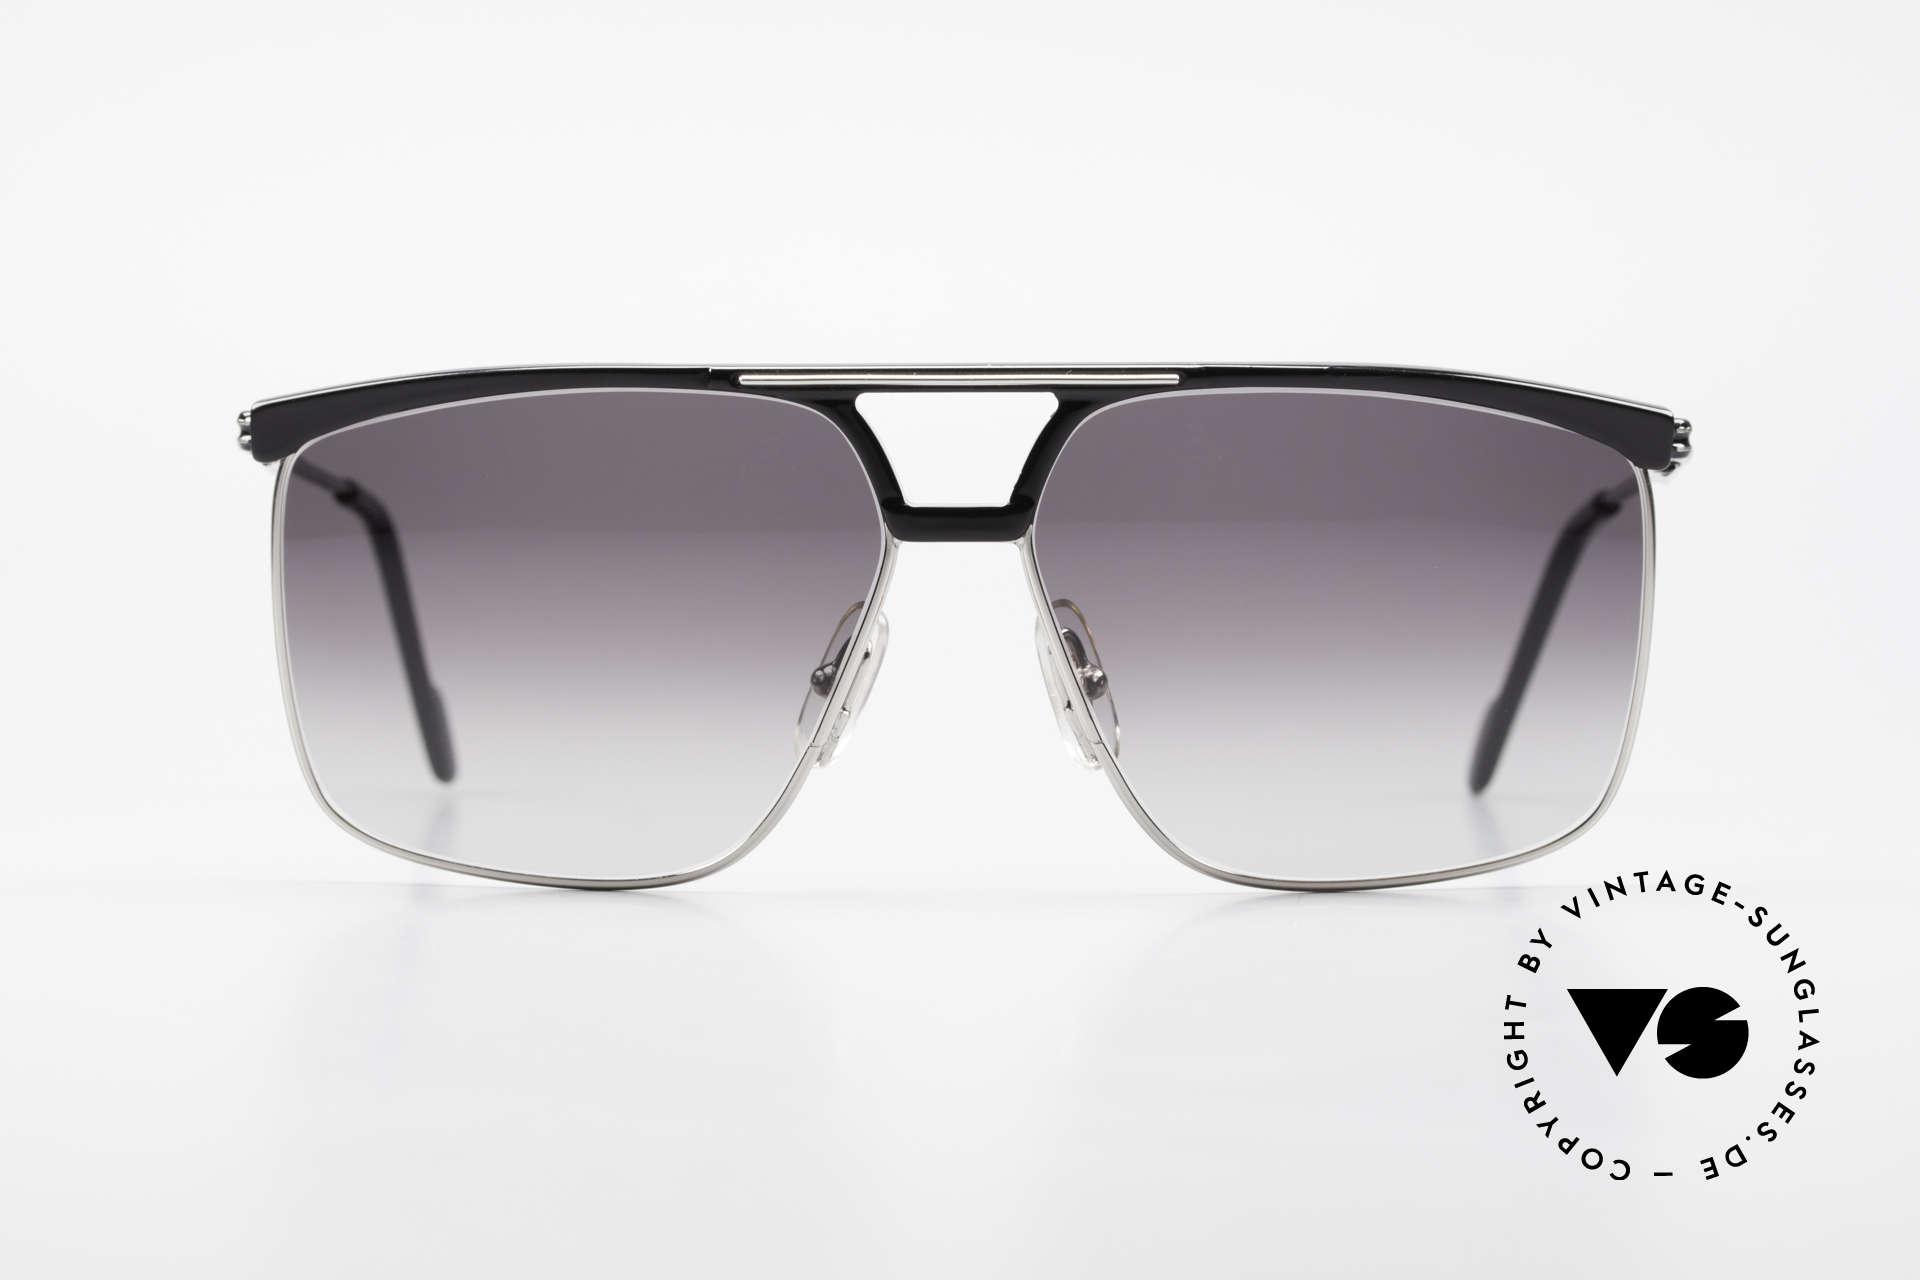 Ferrari F35 X-Large Sunglasses Formula 1, finest quality & superior frame finishing; true vintage, Made for Men